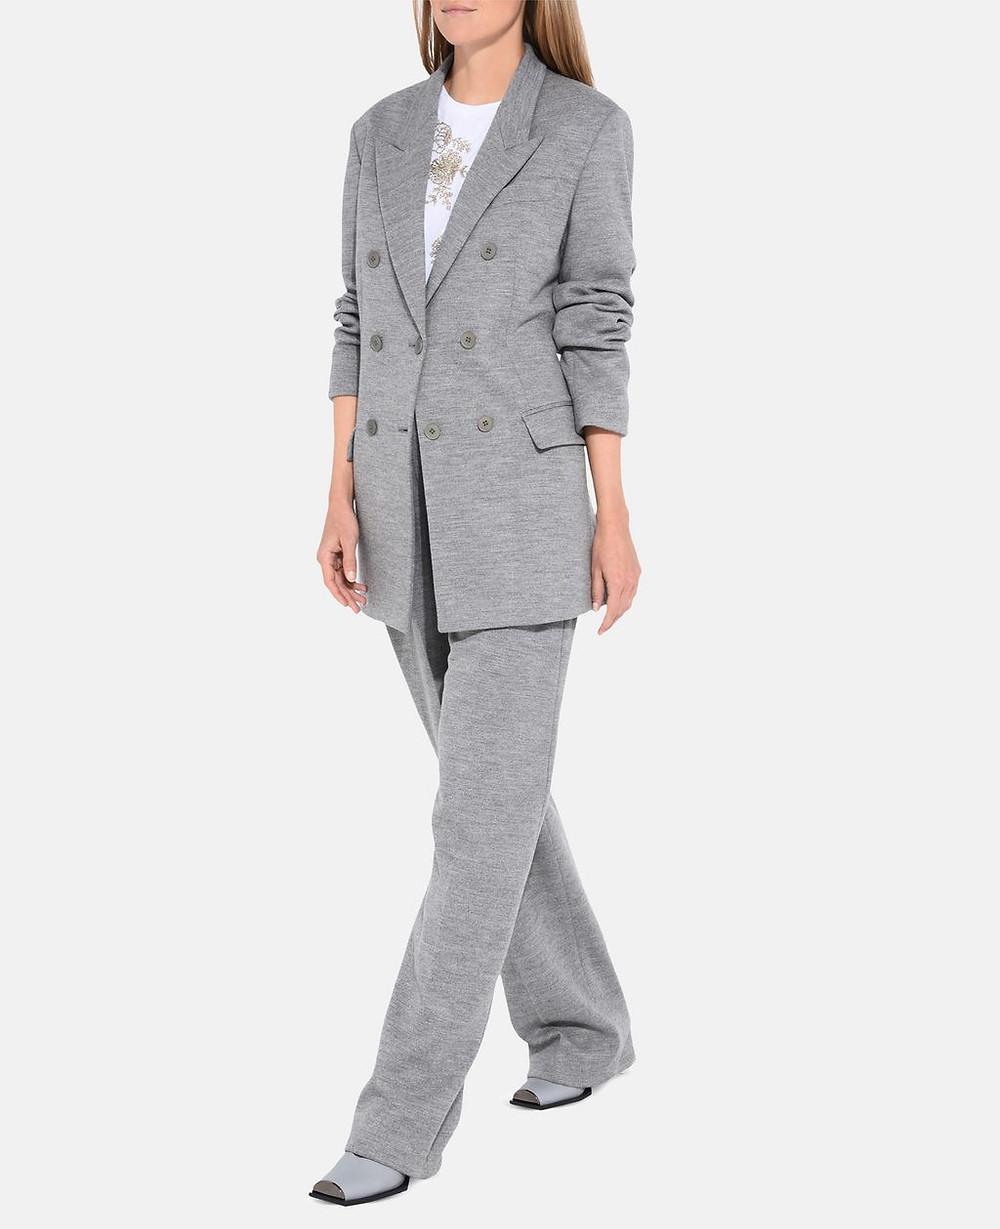 Grijs outfit van Stella McCartney